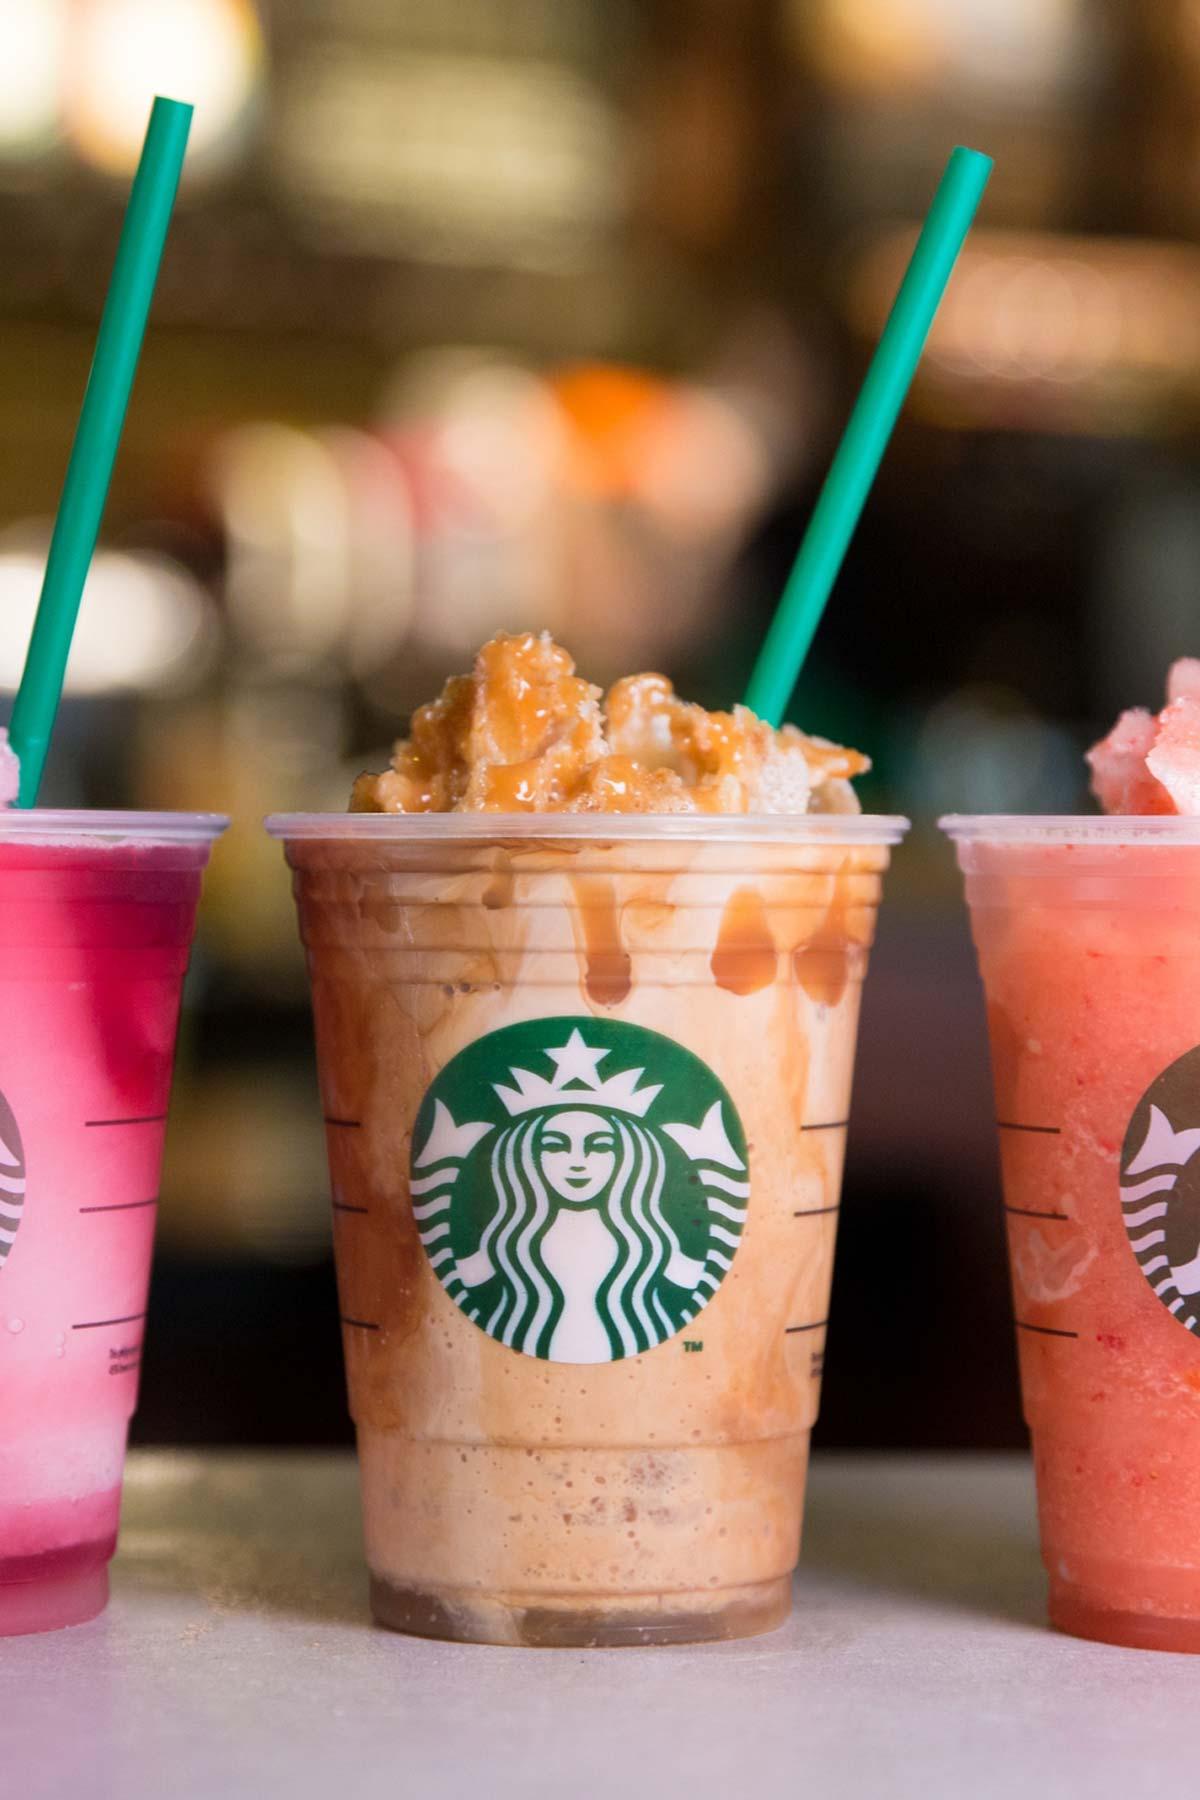 Three Starbucks drinks with green straws.